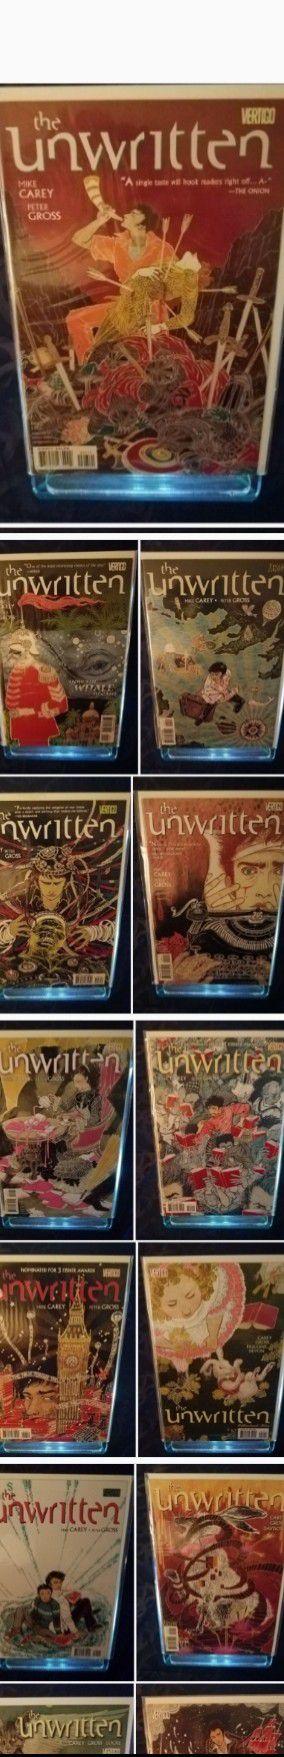 THE UNWRITTEN: 47 COMIC BOOK COLLECTION for Sale in Pomona, CA